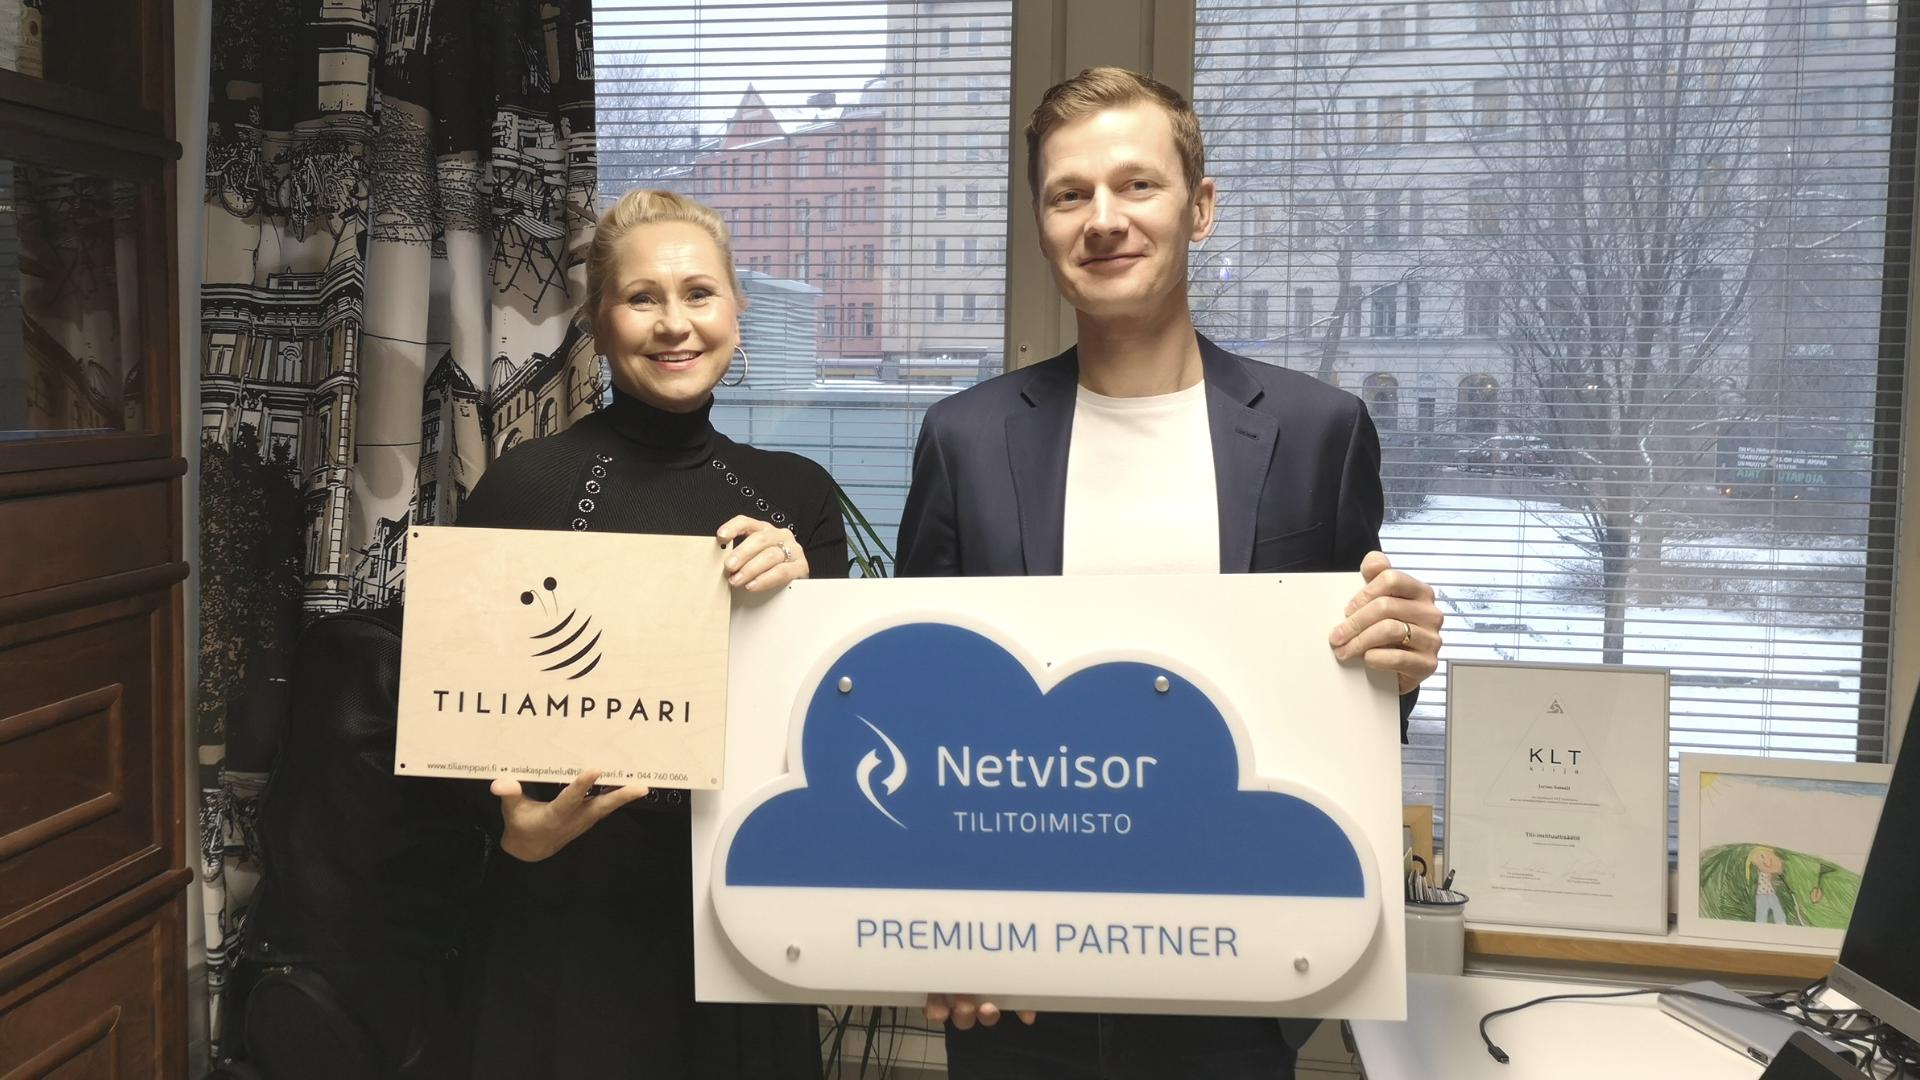 Netvisor-tilitoimisto Tiliampparin Jarmo Sassali